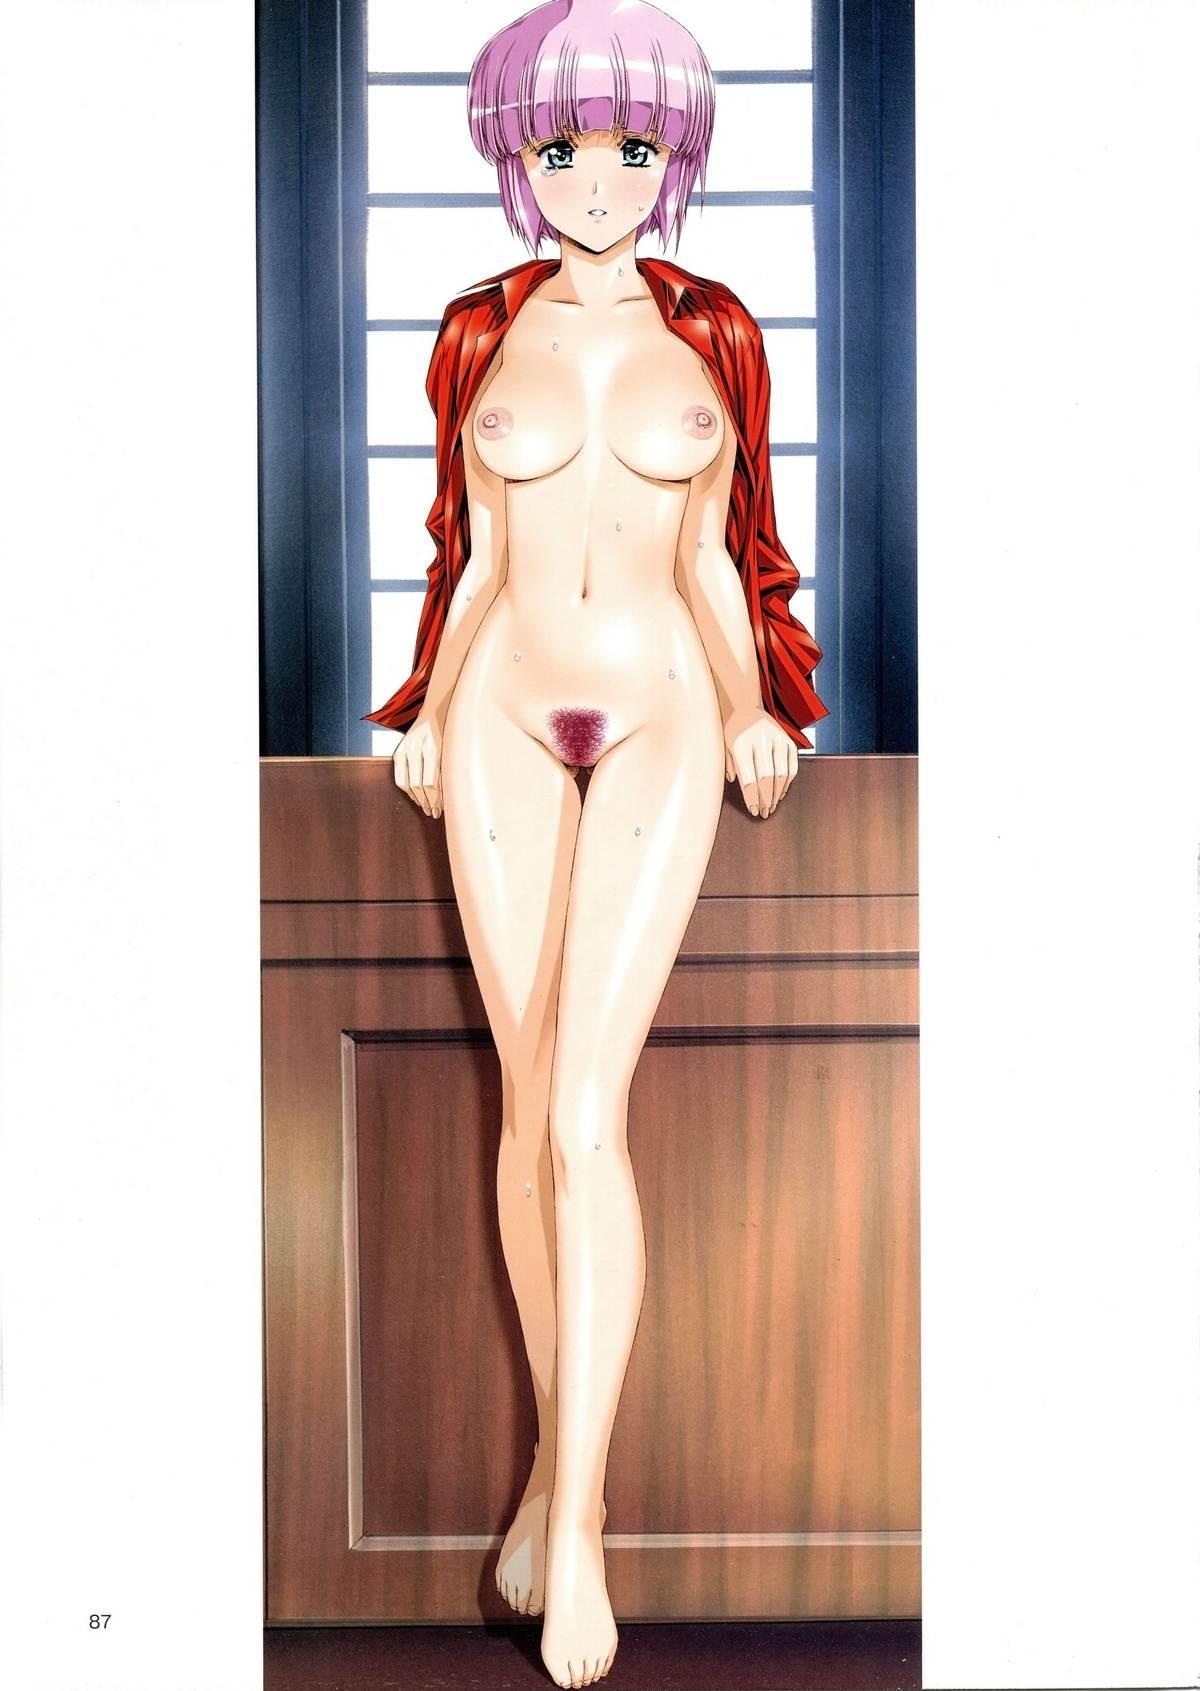 Urushihara Satoshi Illustration reira 78